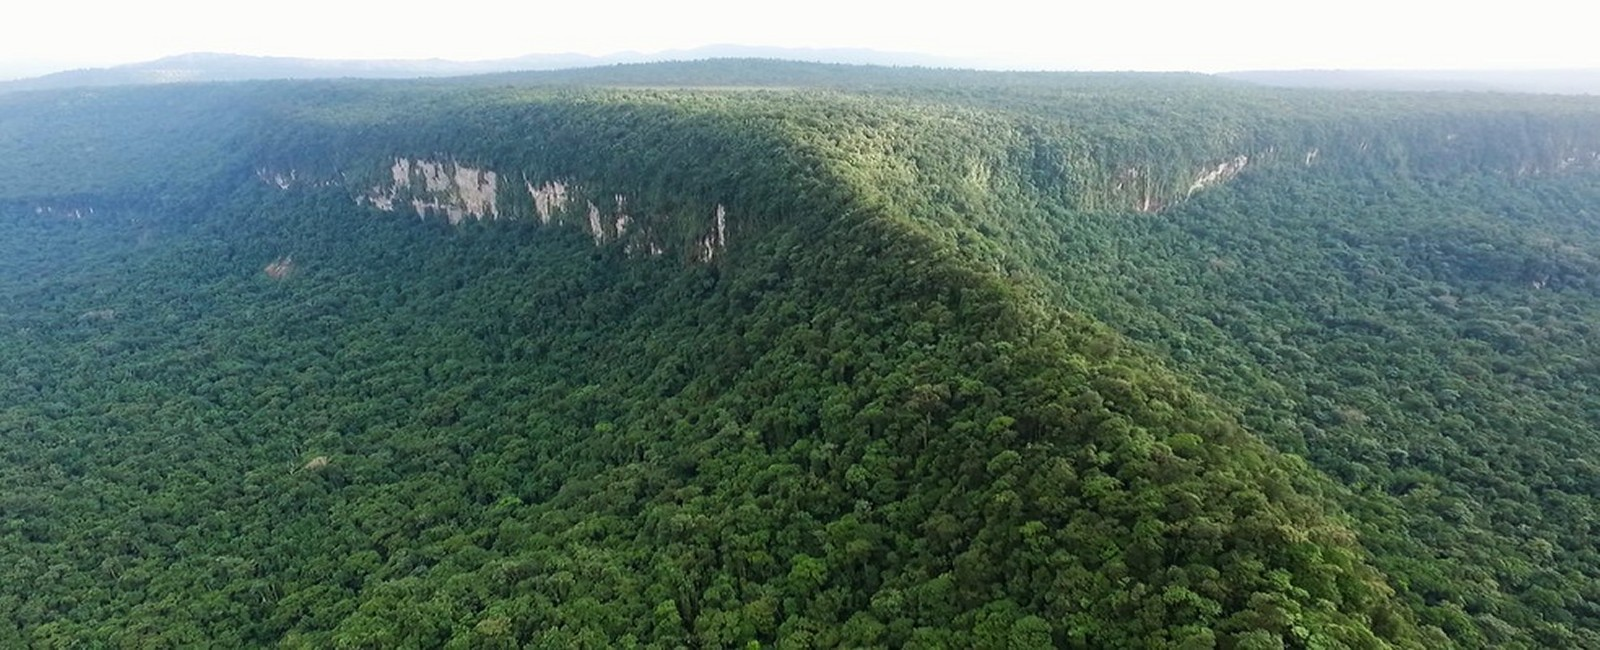 4 Extremos do Brasil